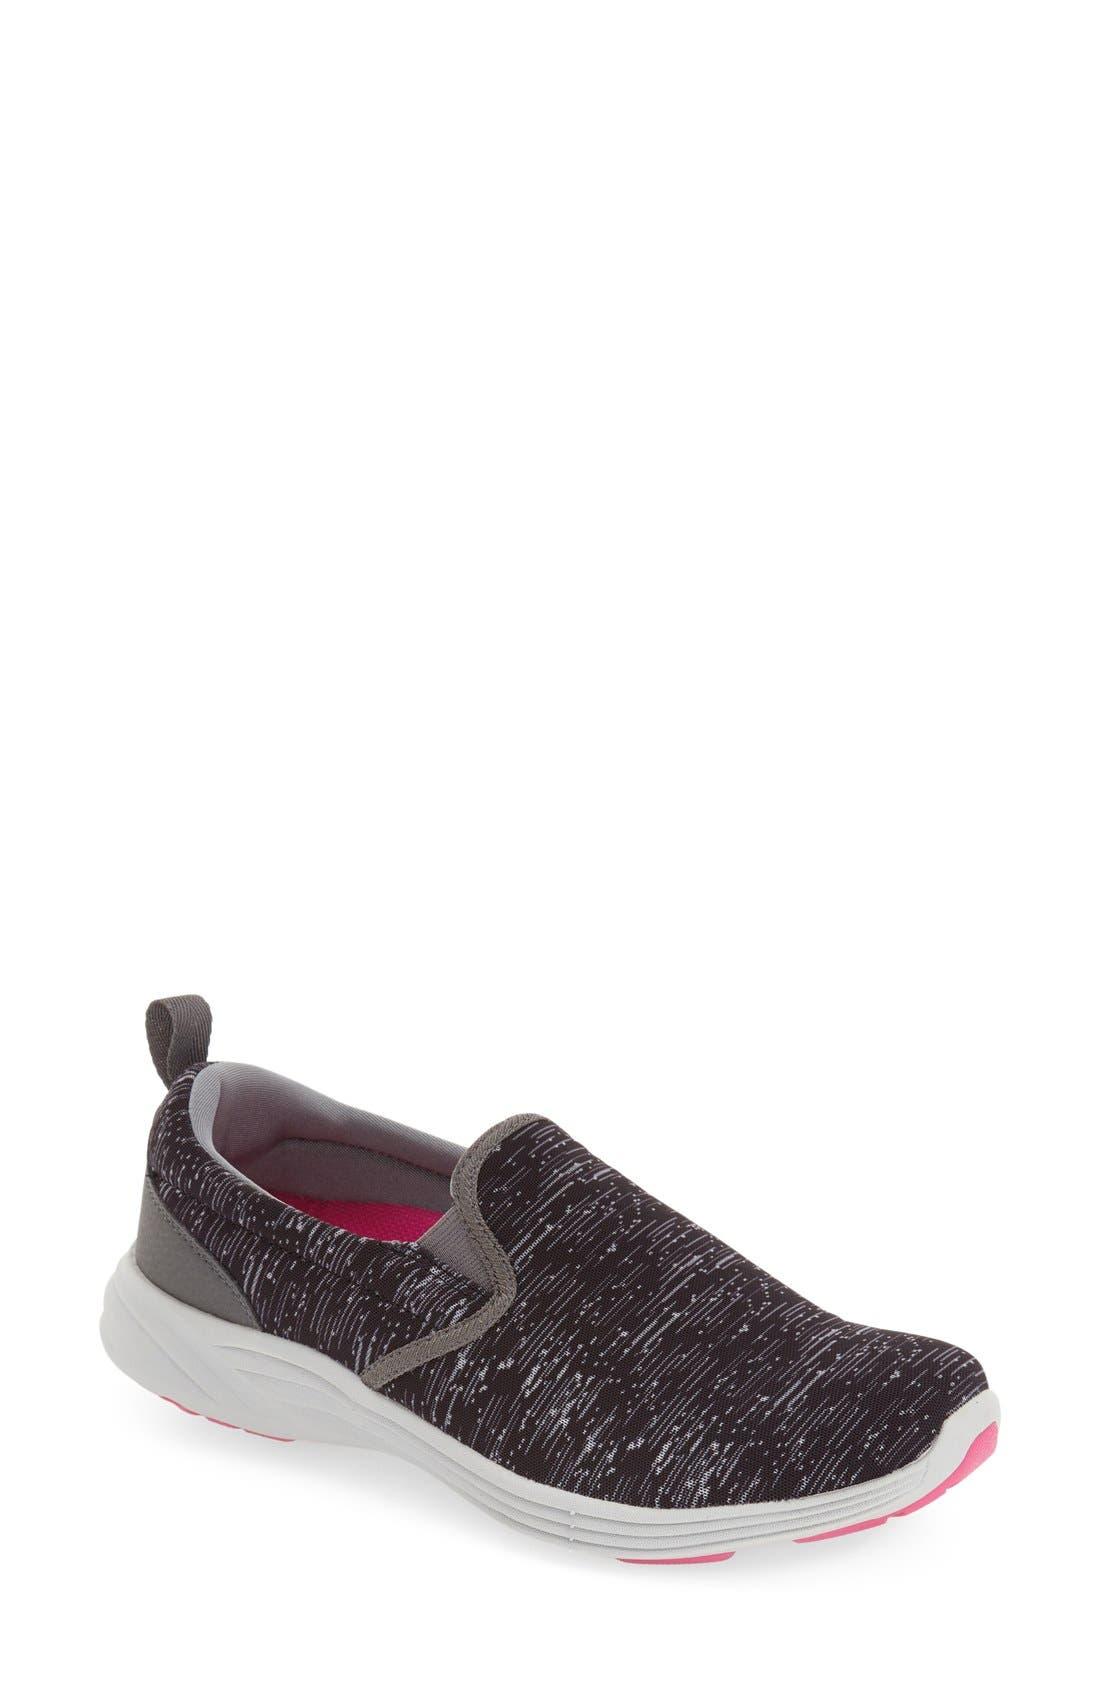 'Kea' Slip-On Sneaker,                         Main,                         color, Black Fabric